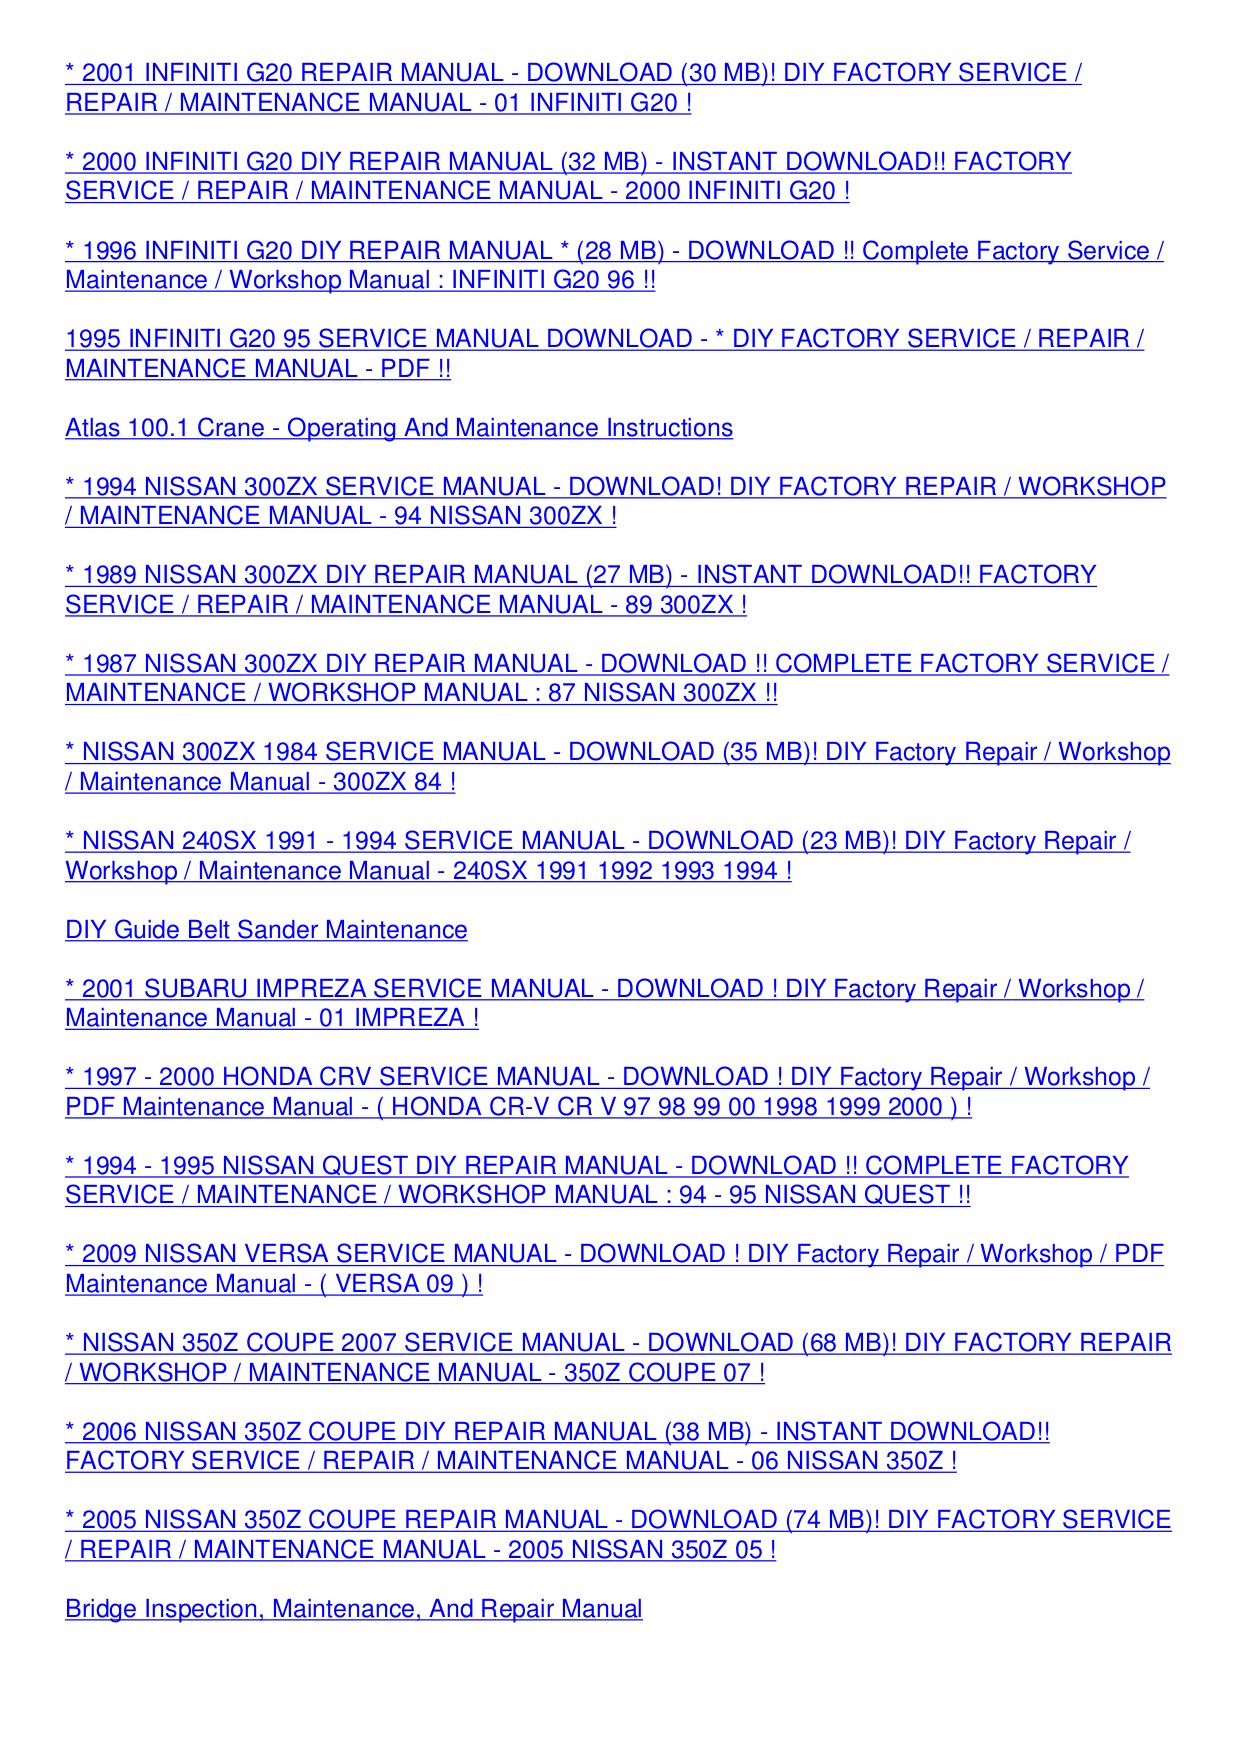 Nissan Quest 2005 Service Manual Recomended Car Infiniti G20 Repair Panasonic